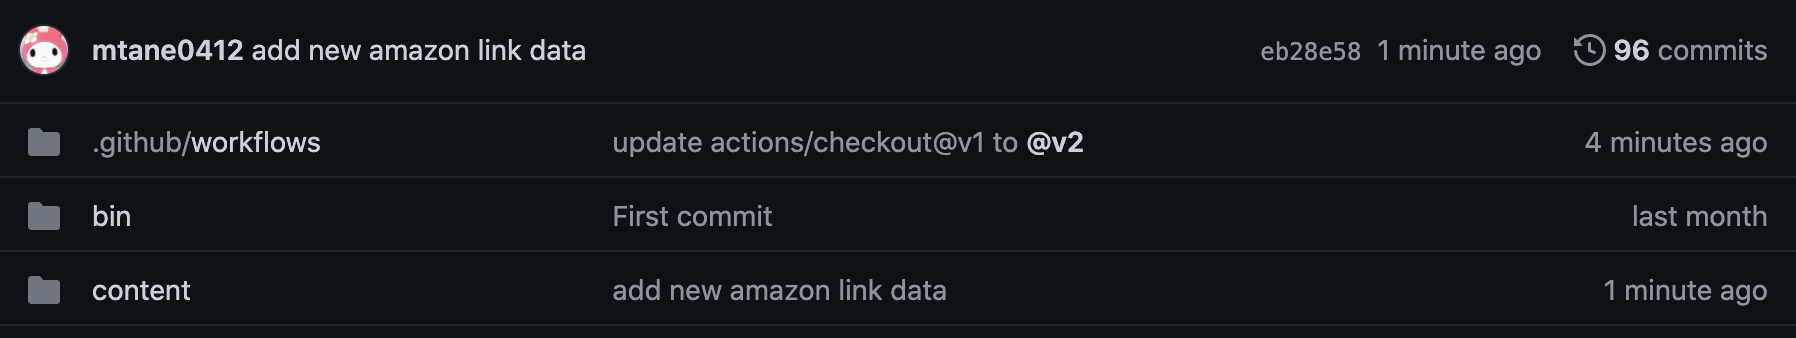 add-new-amazon-link-data